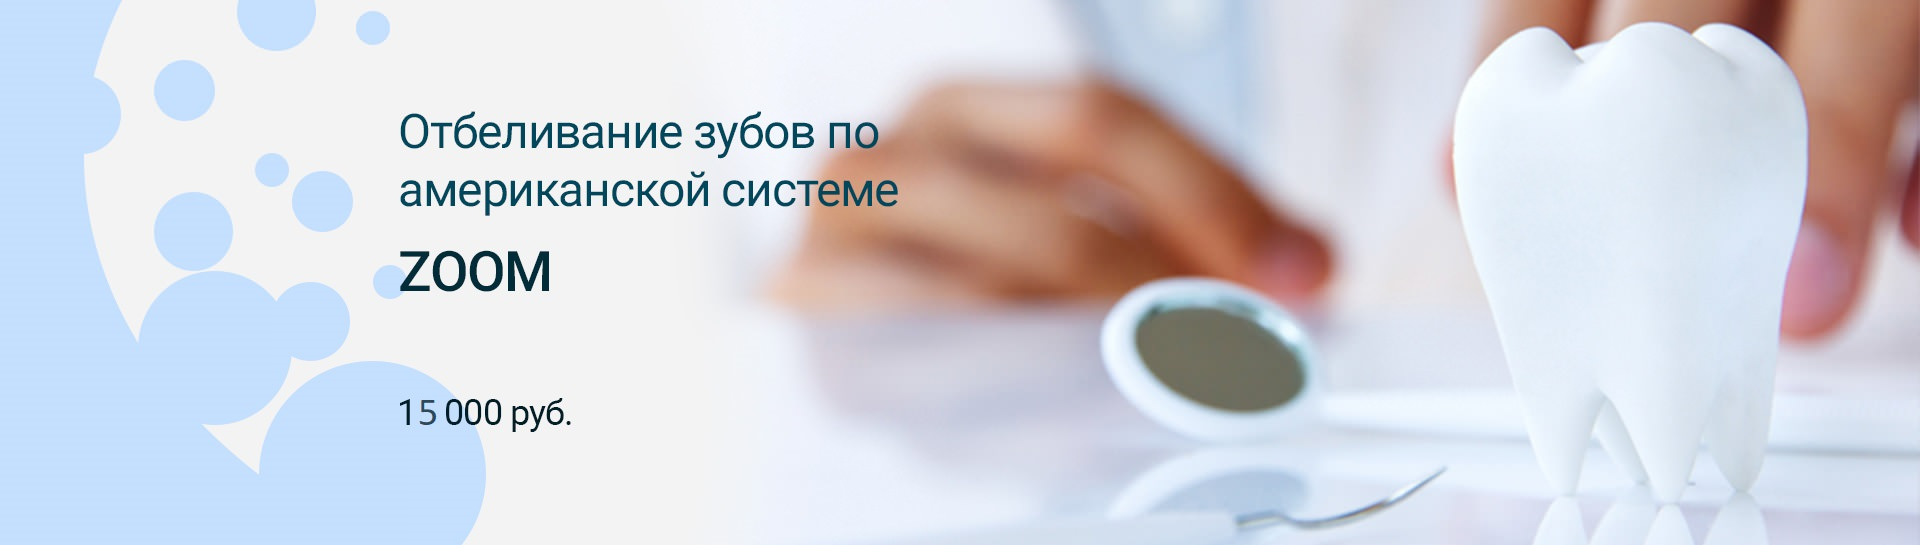 http://denta-maryino.ru/wp-content/uploads/zoom-akcija.jpg 1x, http://denta-maryino.ru/wp-content/cache/thumb/b3/0d7ccc06ceab9b3_1320x545.jpg 1320w